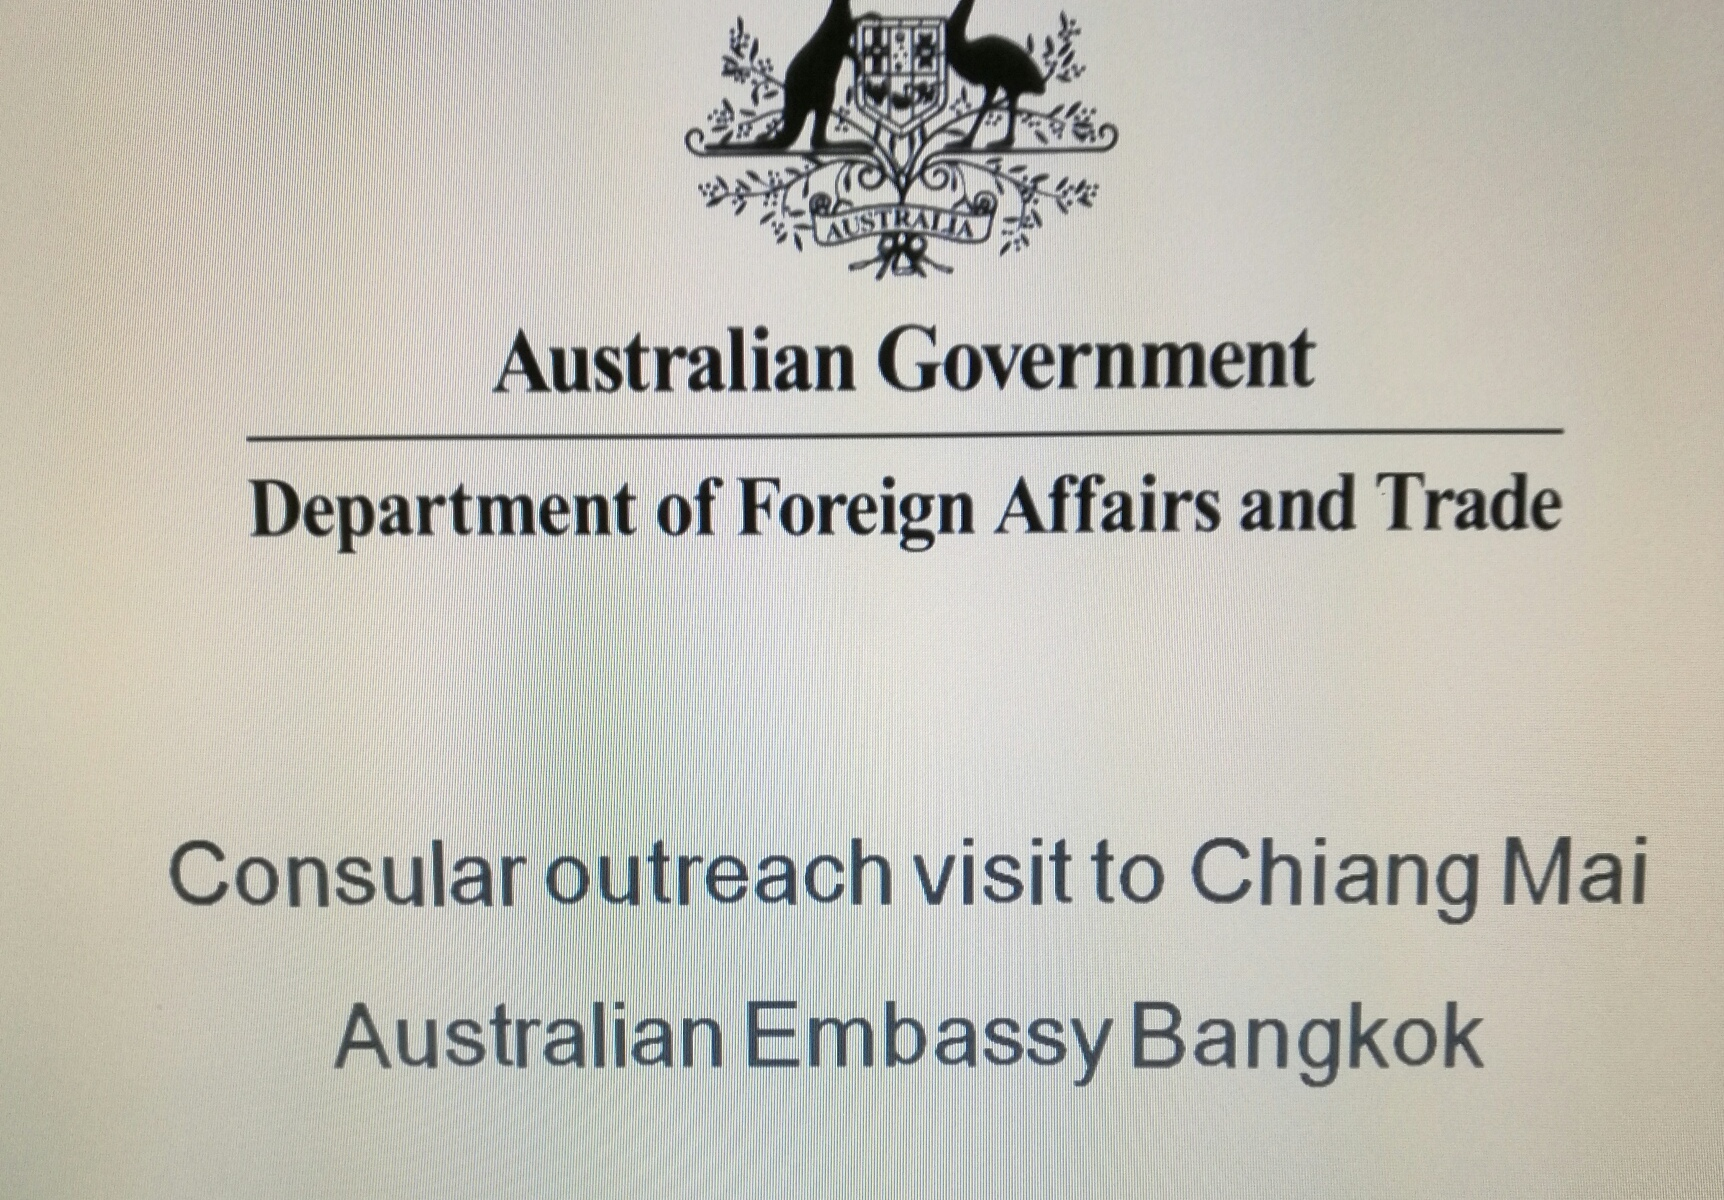 Australian embassy consular outreach program 2018 australian posted on april 7 2018 april 7 2018 by australian honorary consul chiangmai tranquil in thailand falaconquin